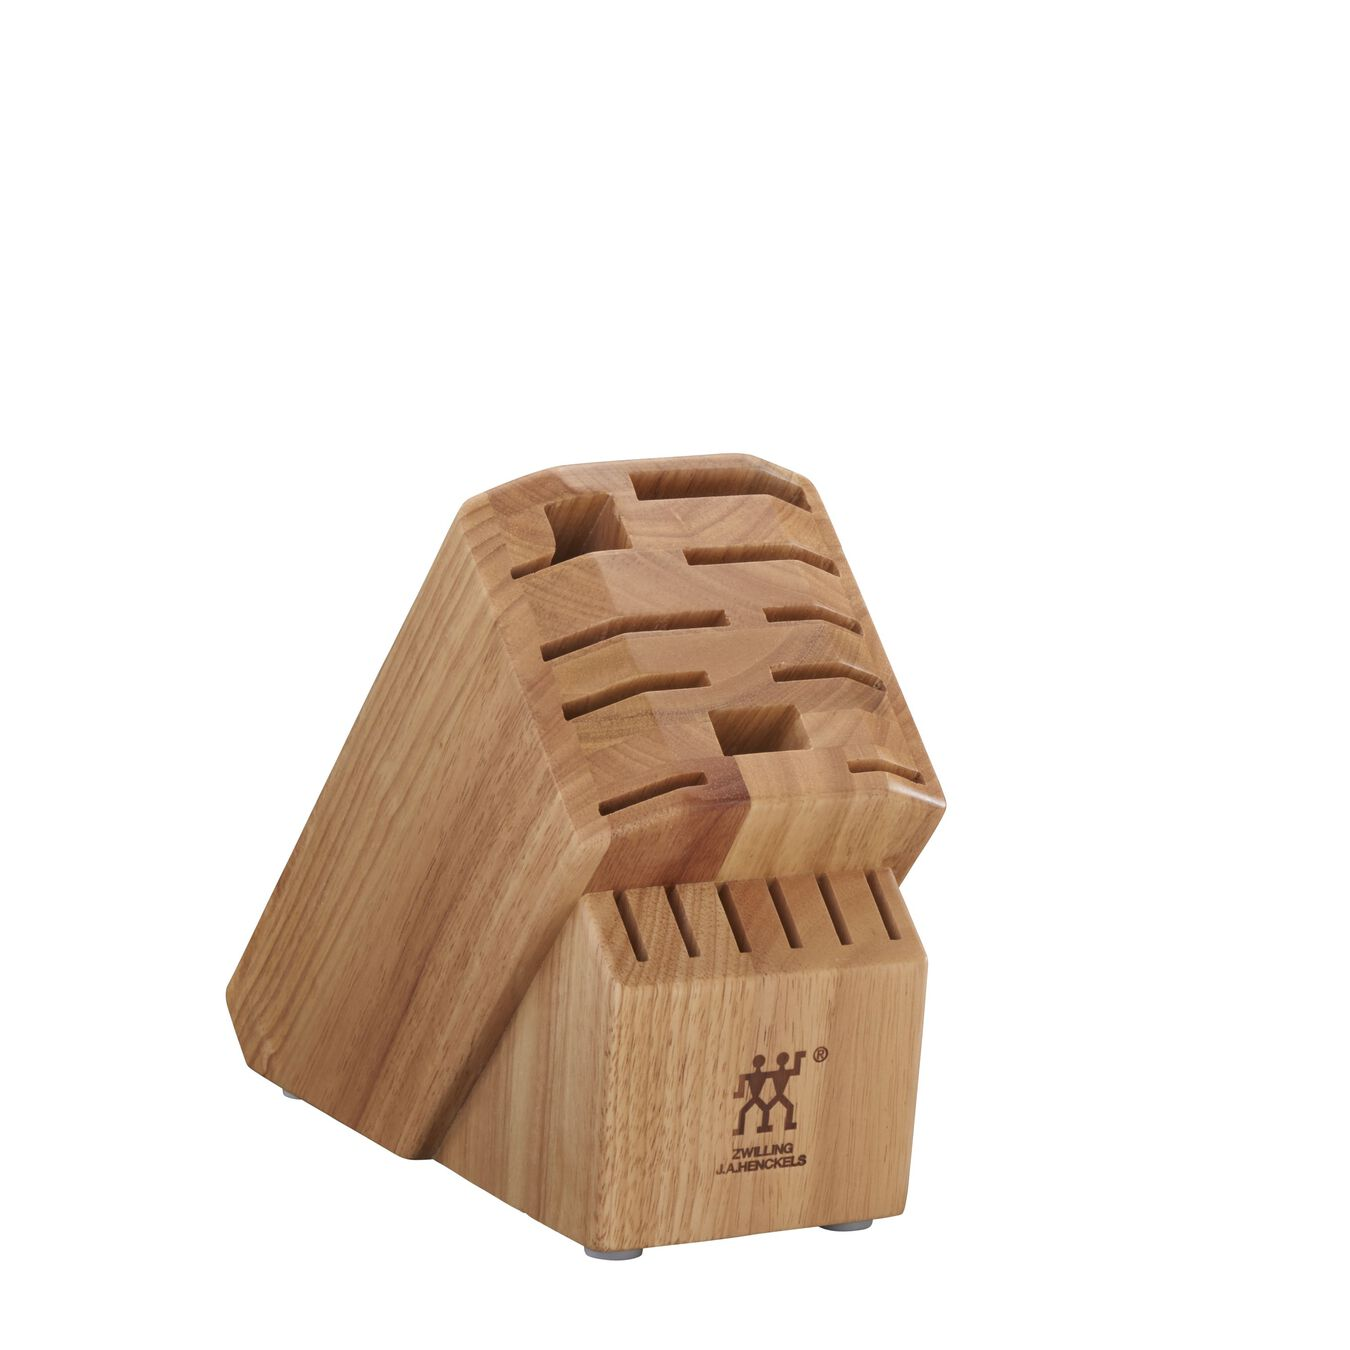 Rubberwood Natural 16-slot block,,large 1